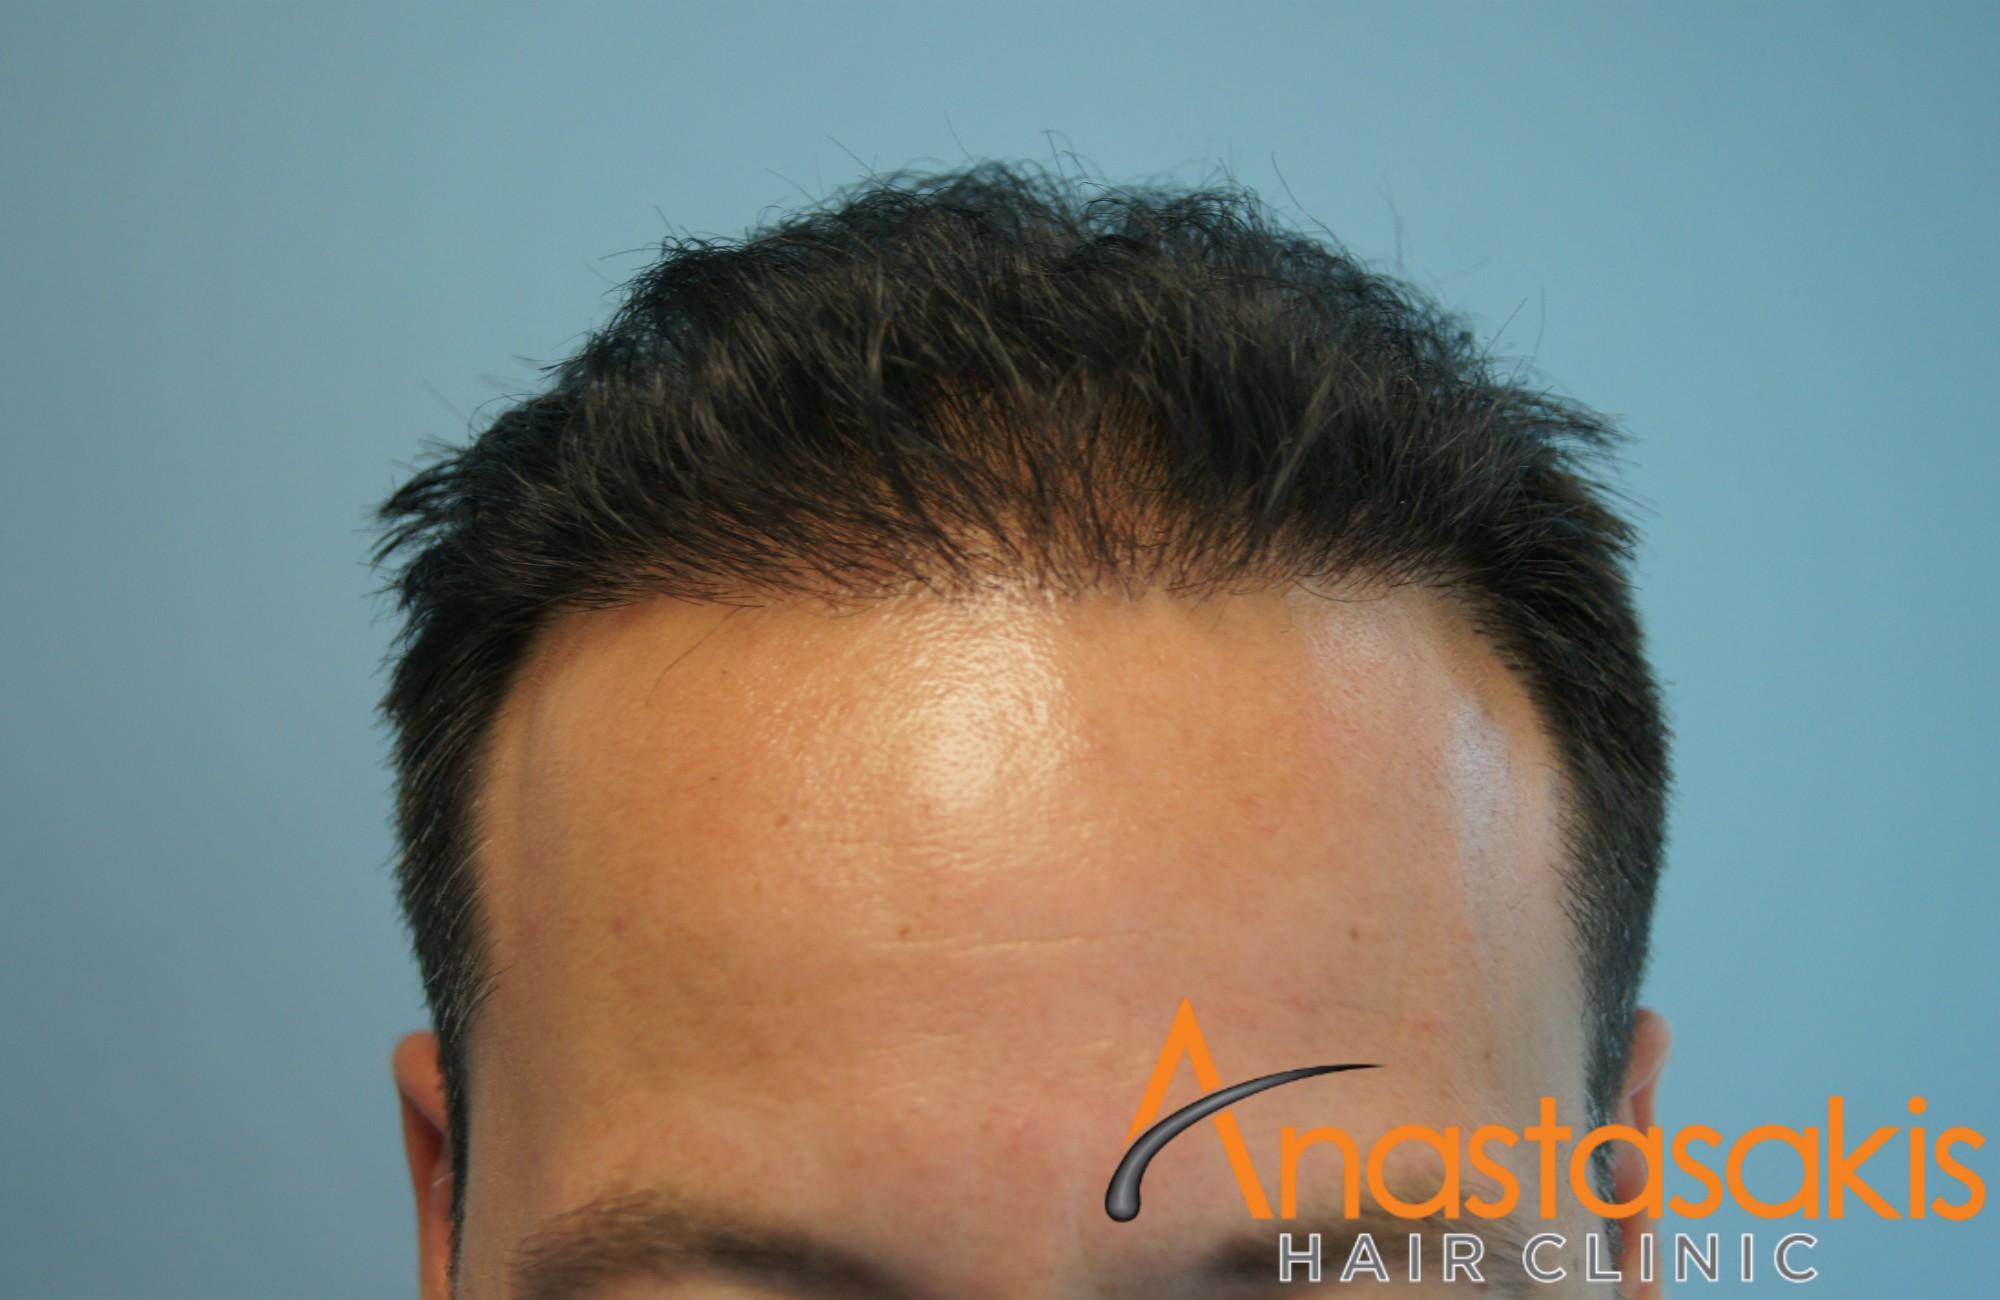 hairline βαγγελη μαρουση μετα τη μεταμοσχευση μαλλιων με 2500 fus